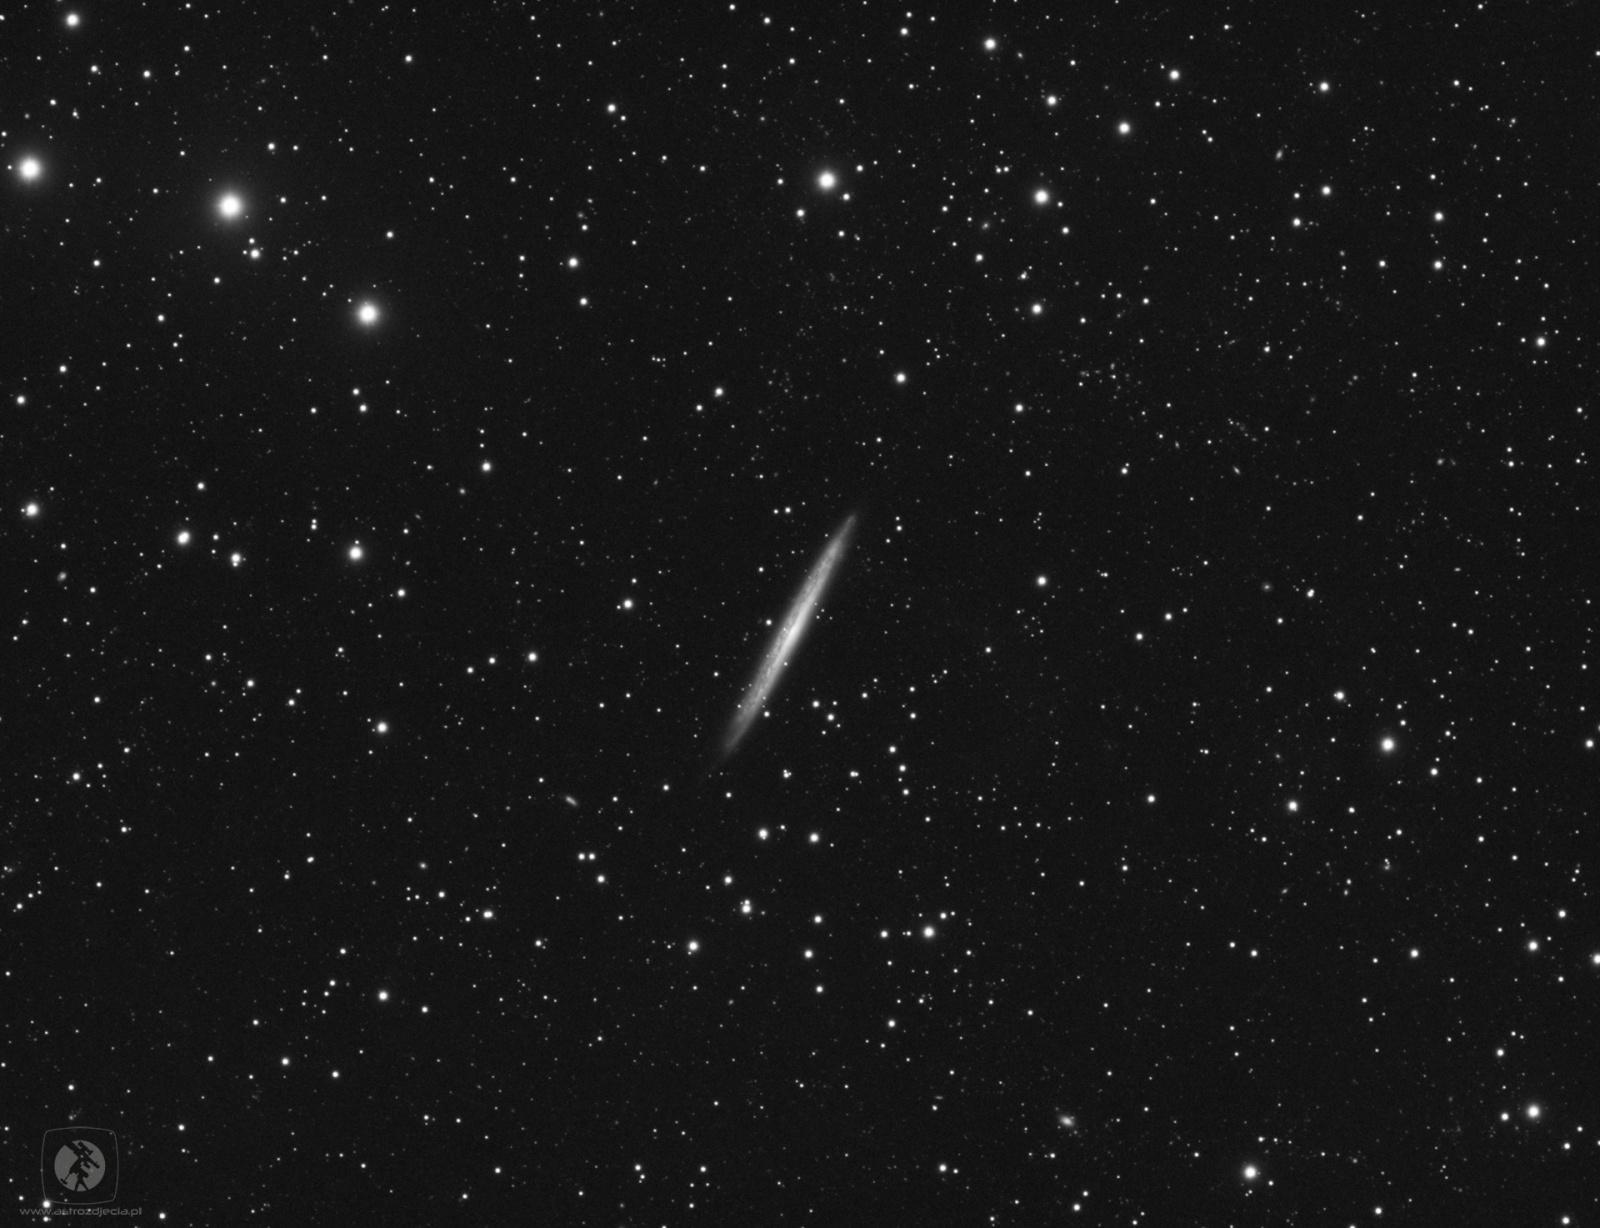 NGC5907.thumb.jpg.6b8c1a8f0a4aaa7e08c97c2f50cec745.jpg